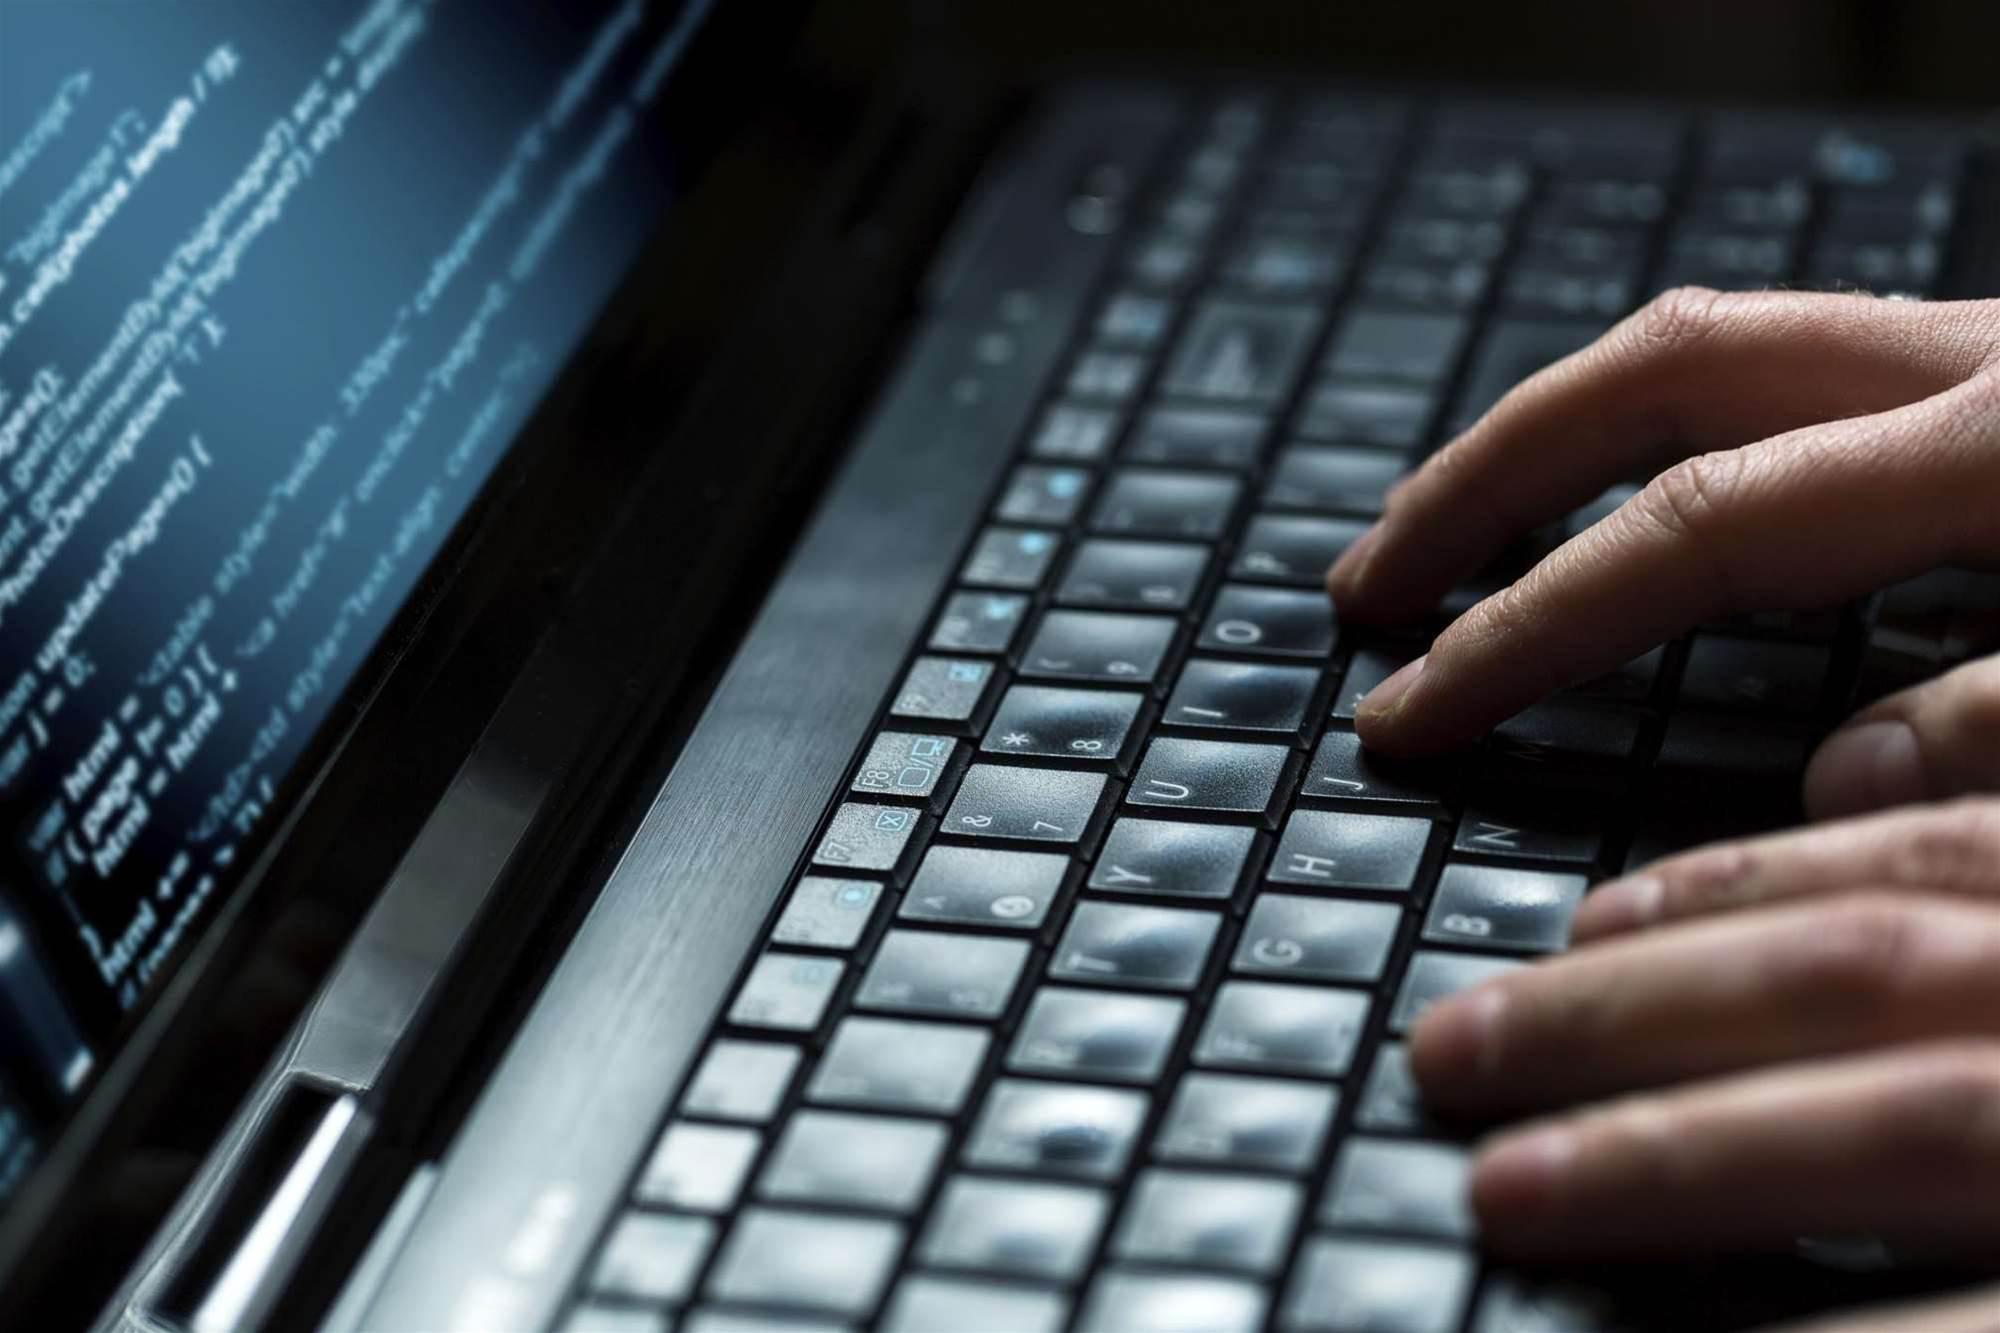 Beyond ACORN: Cracking the infosec skills nut